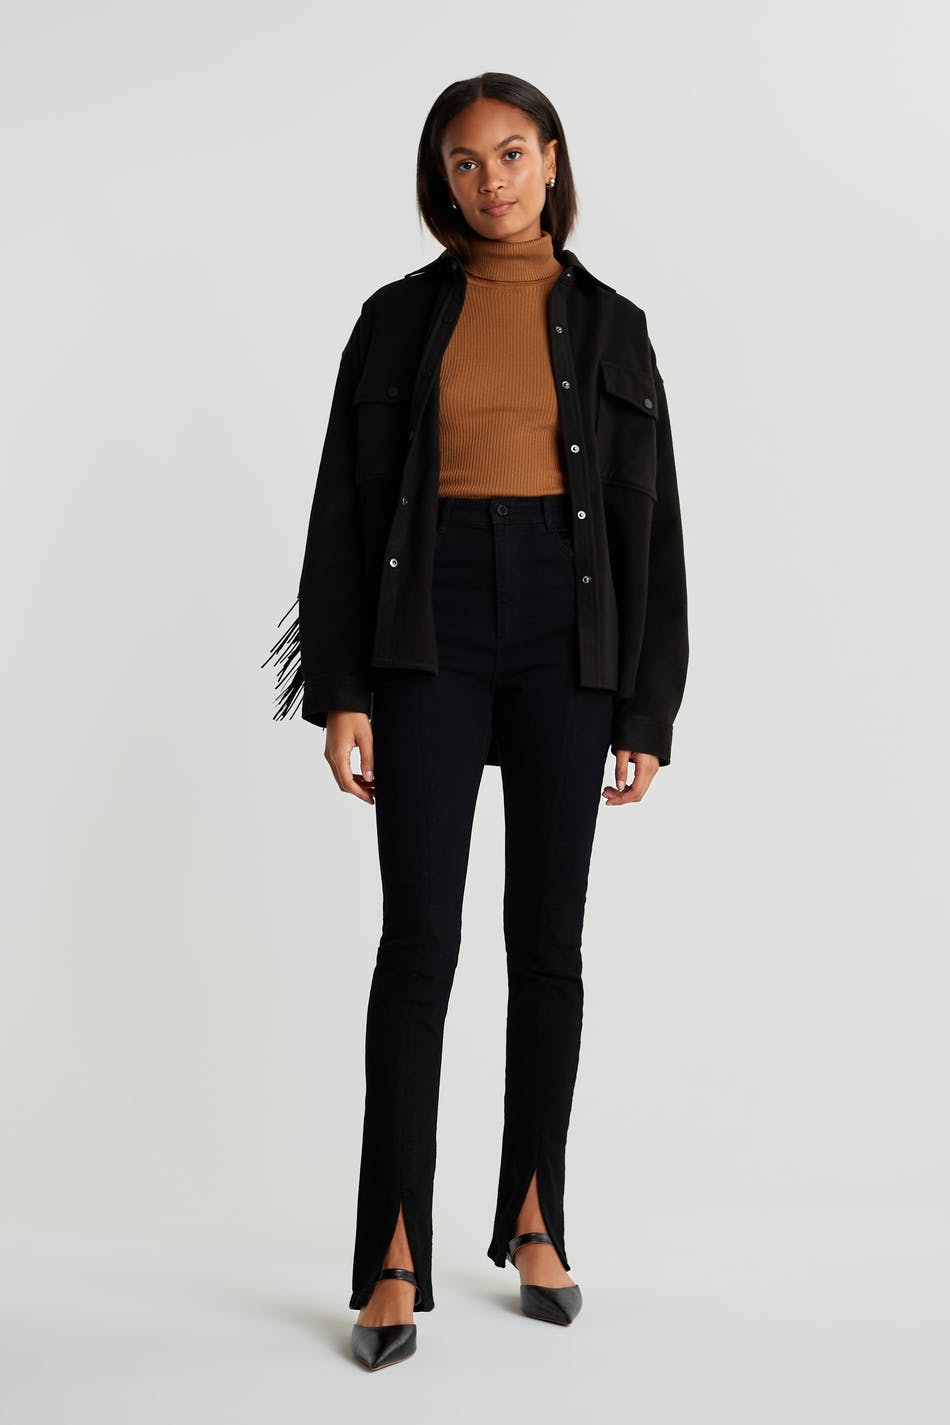 Superhigh slit jeans